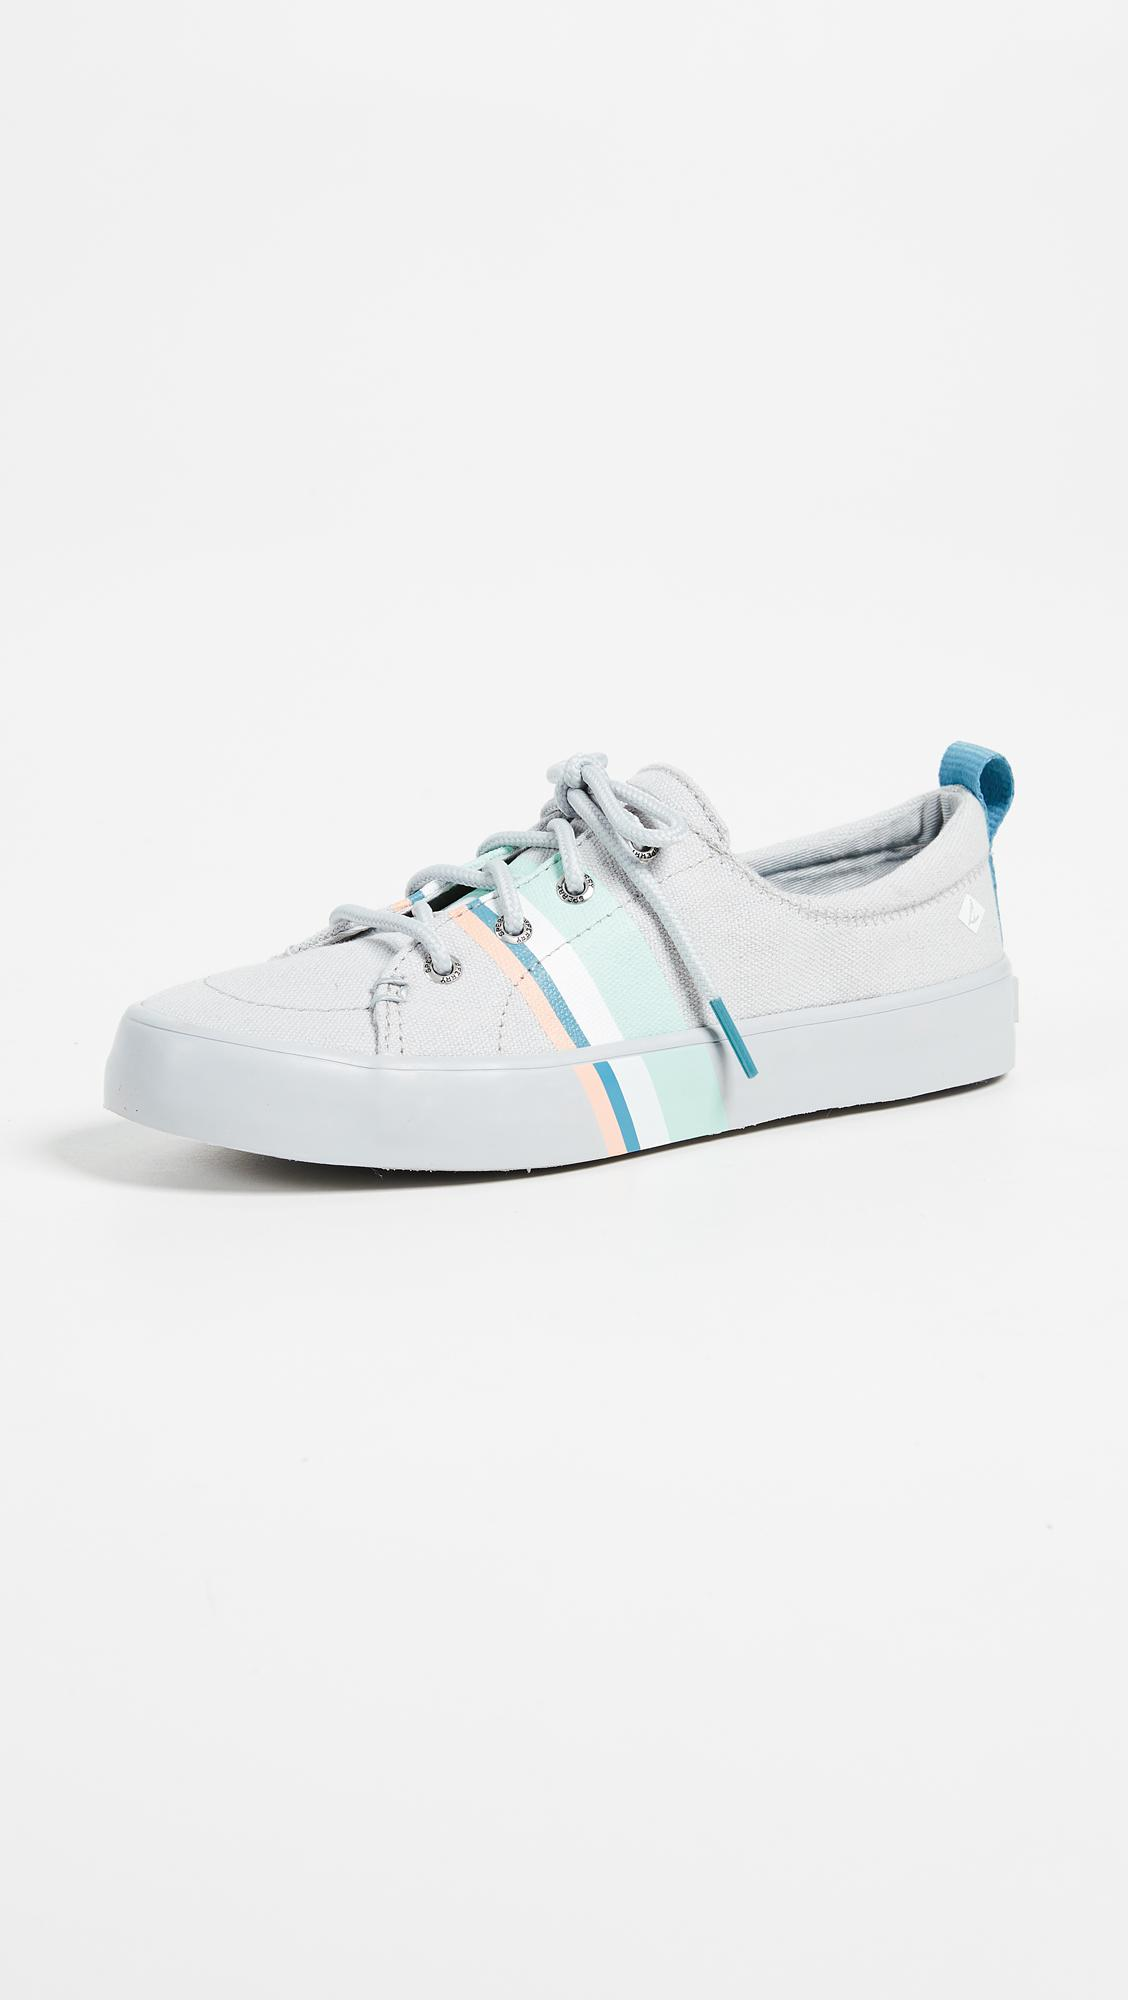 Crest Vibe Indigo Stripe Canvas Slip On Sneakers XNz6n1vXt